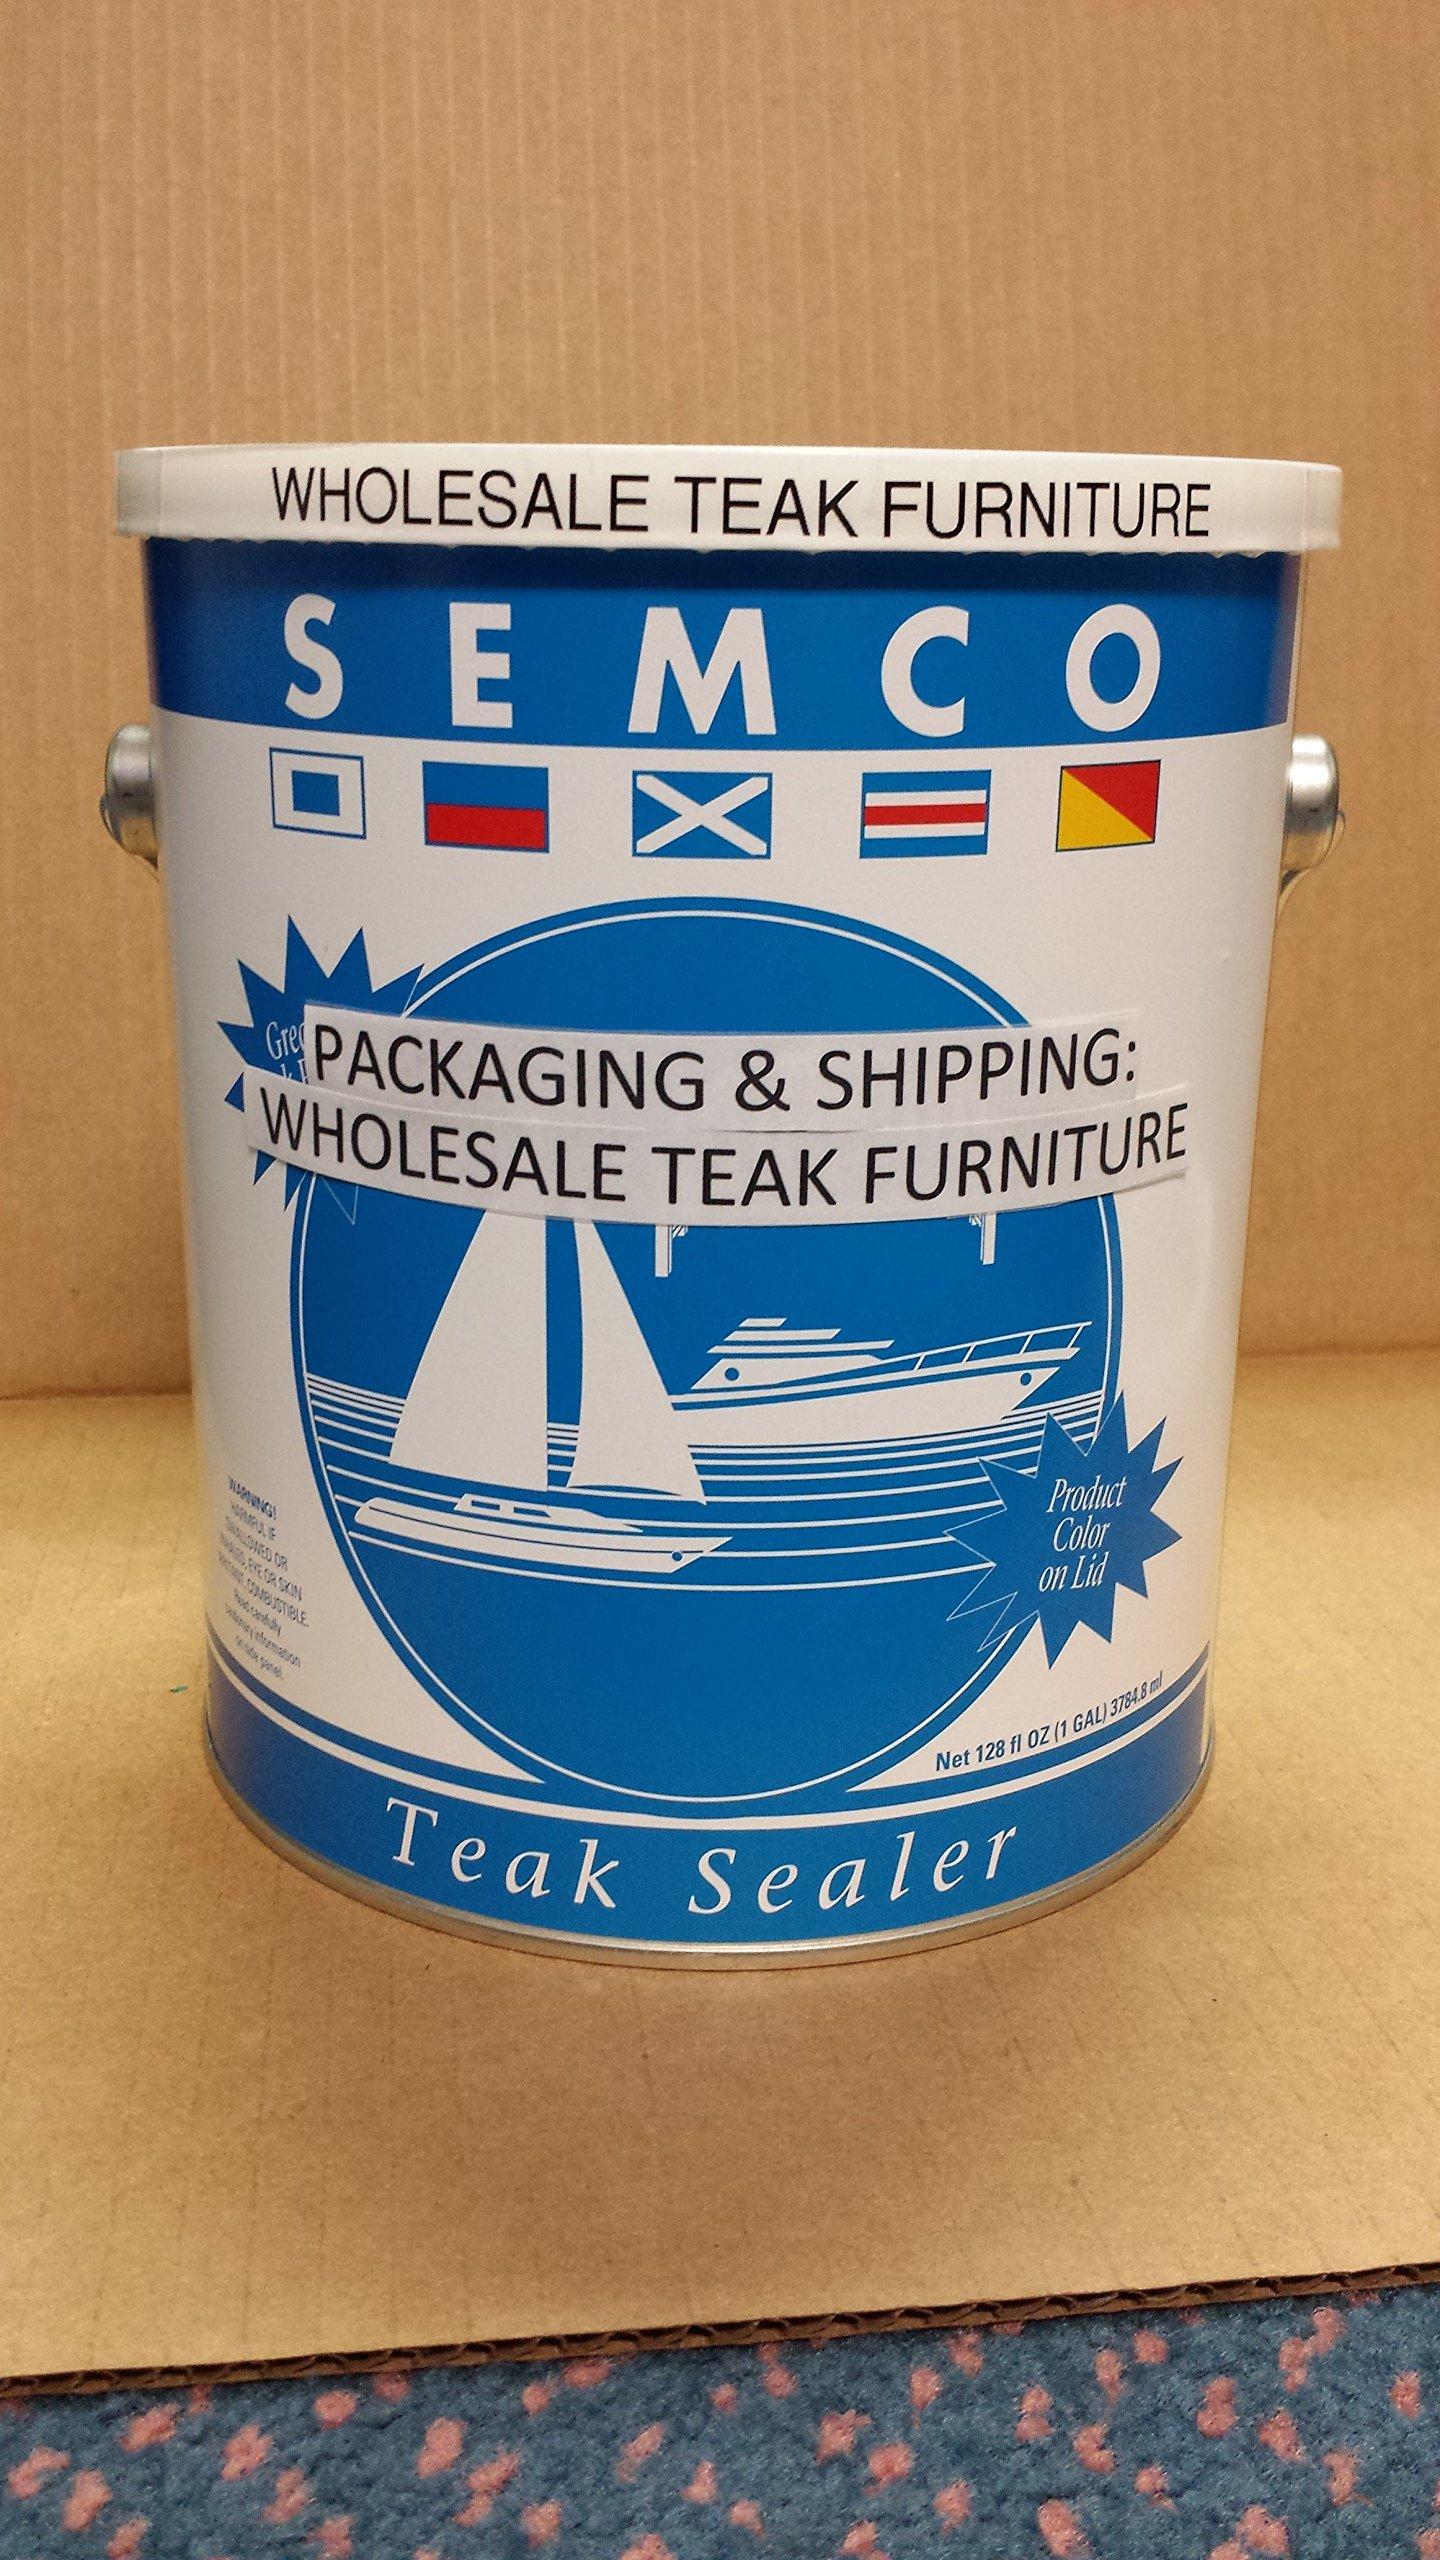 TeakStation Semco Teak Sealer 1 Gallon Honey Tone Finish Sealant Protector by TeakStation